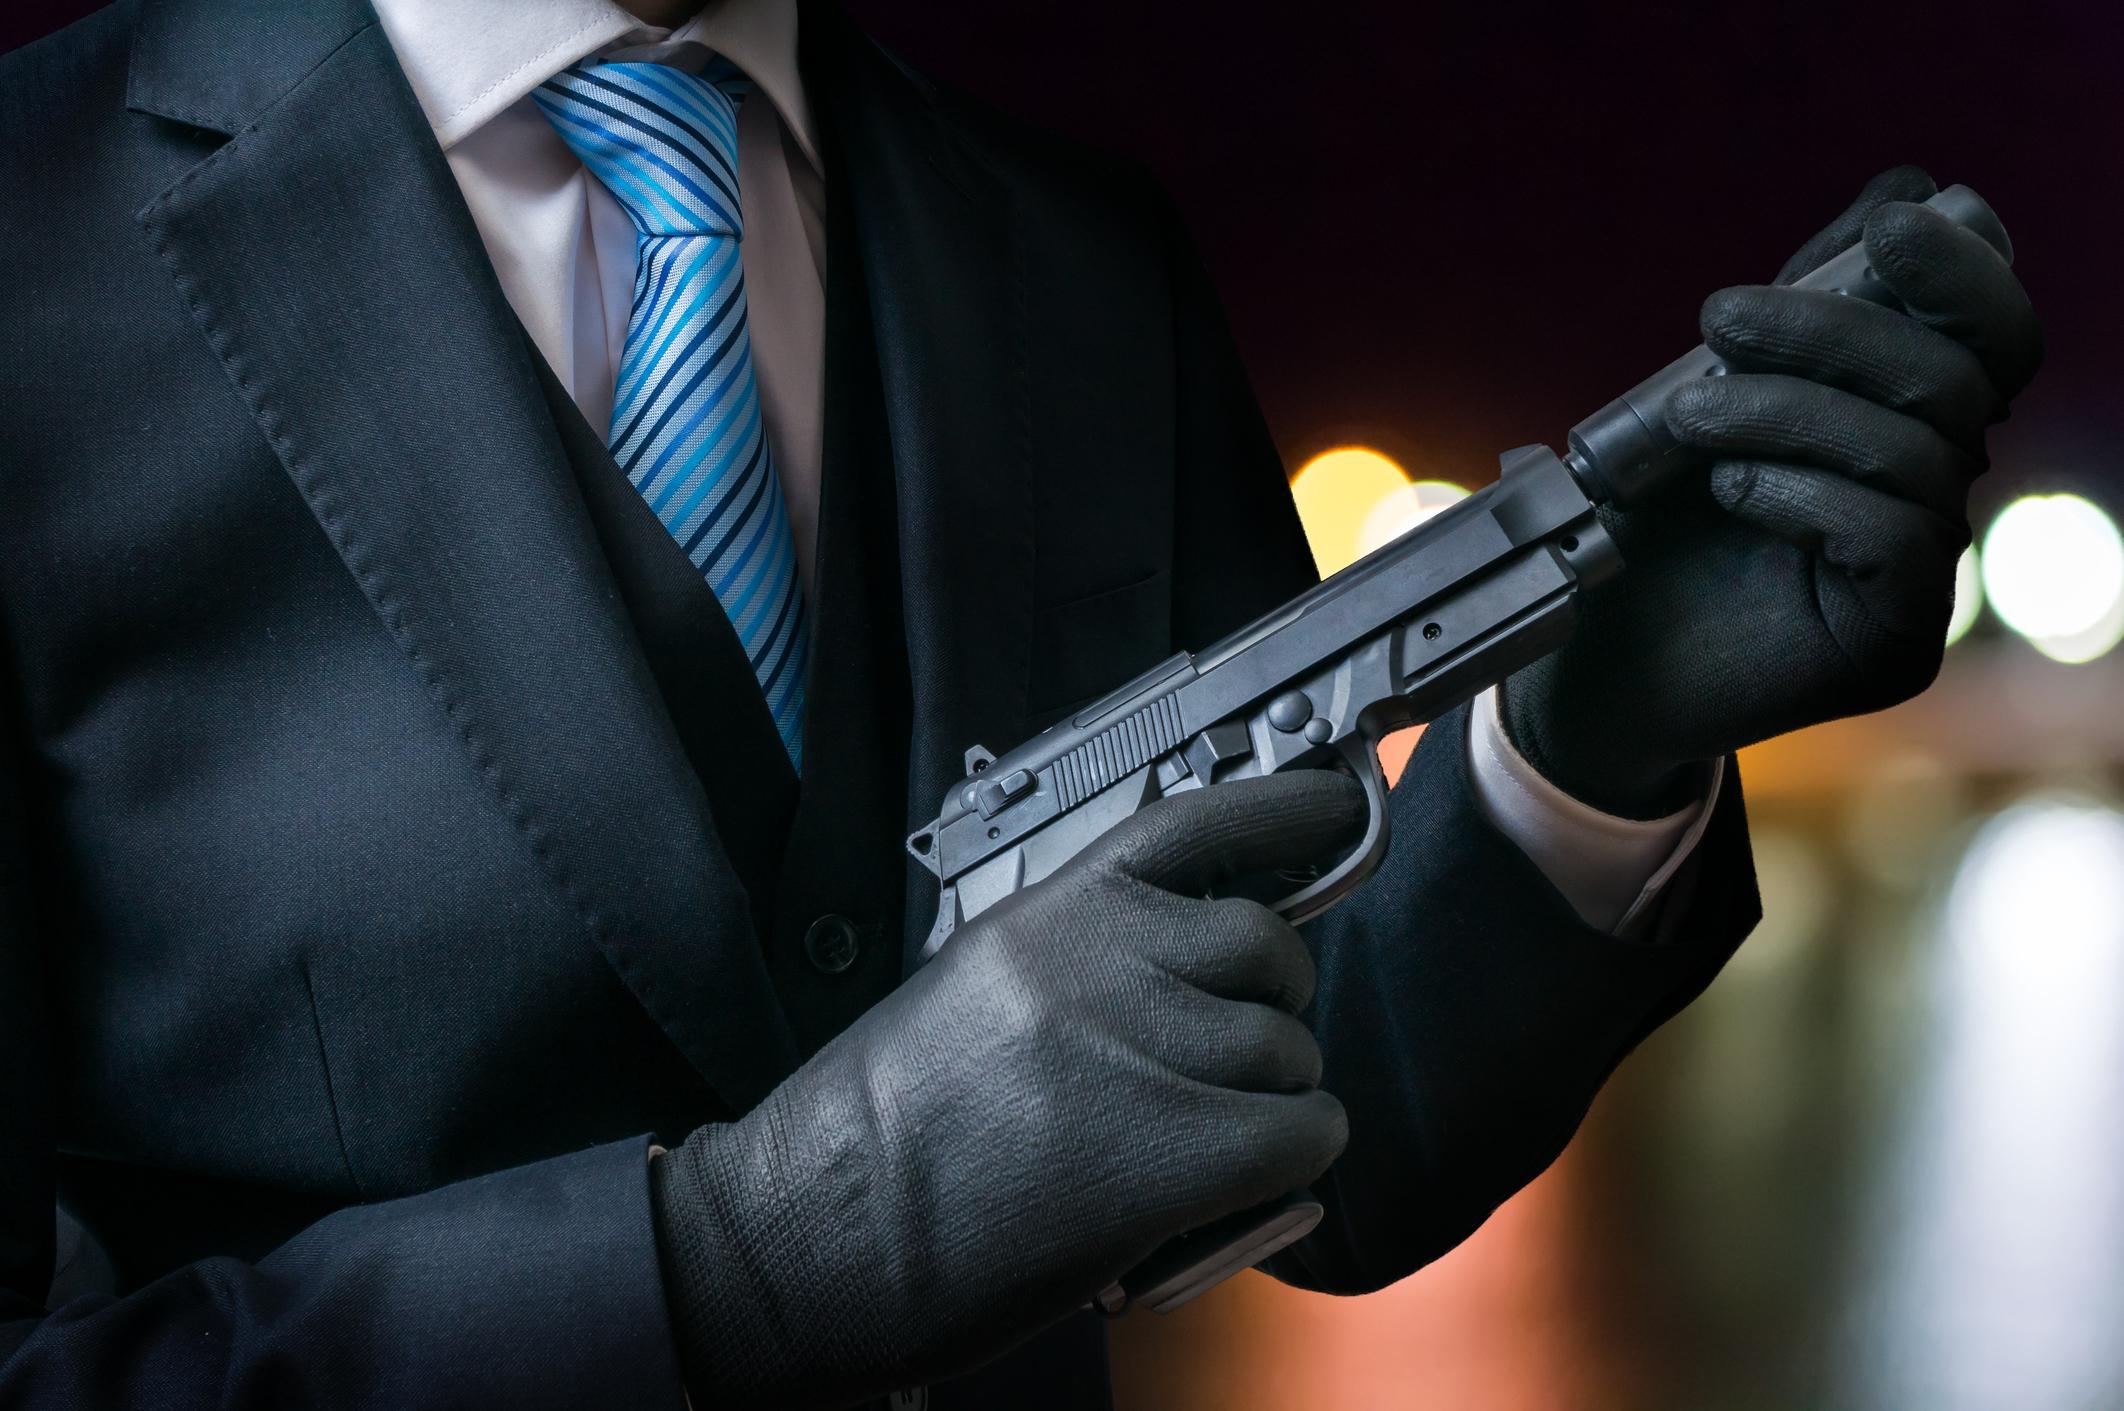 A killer putting a silencer on a gun.